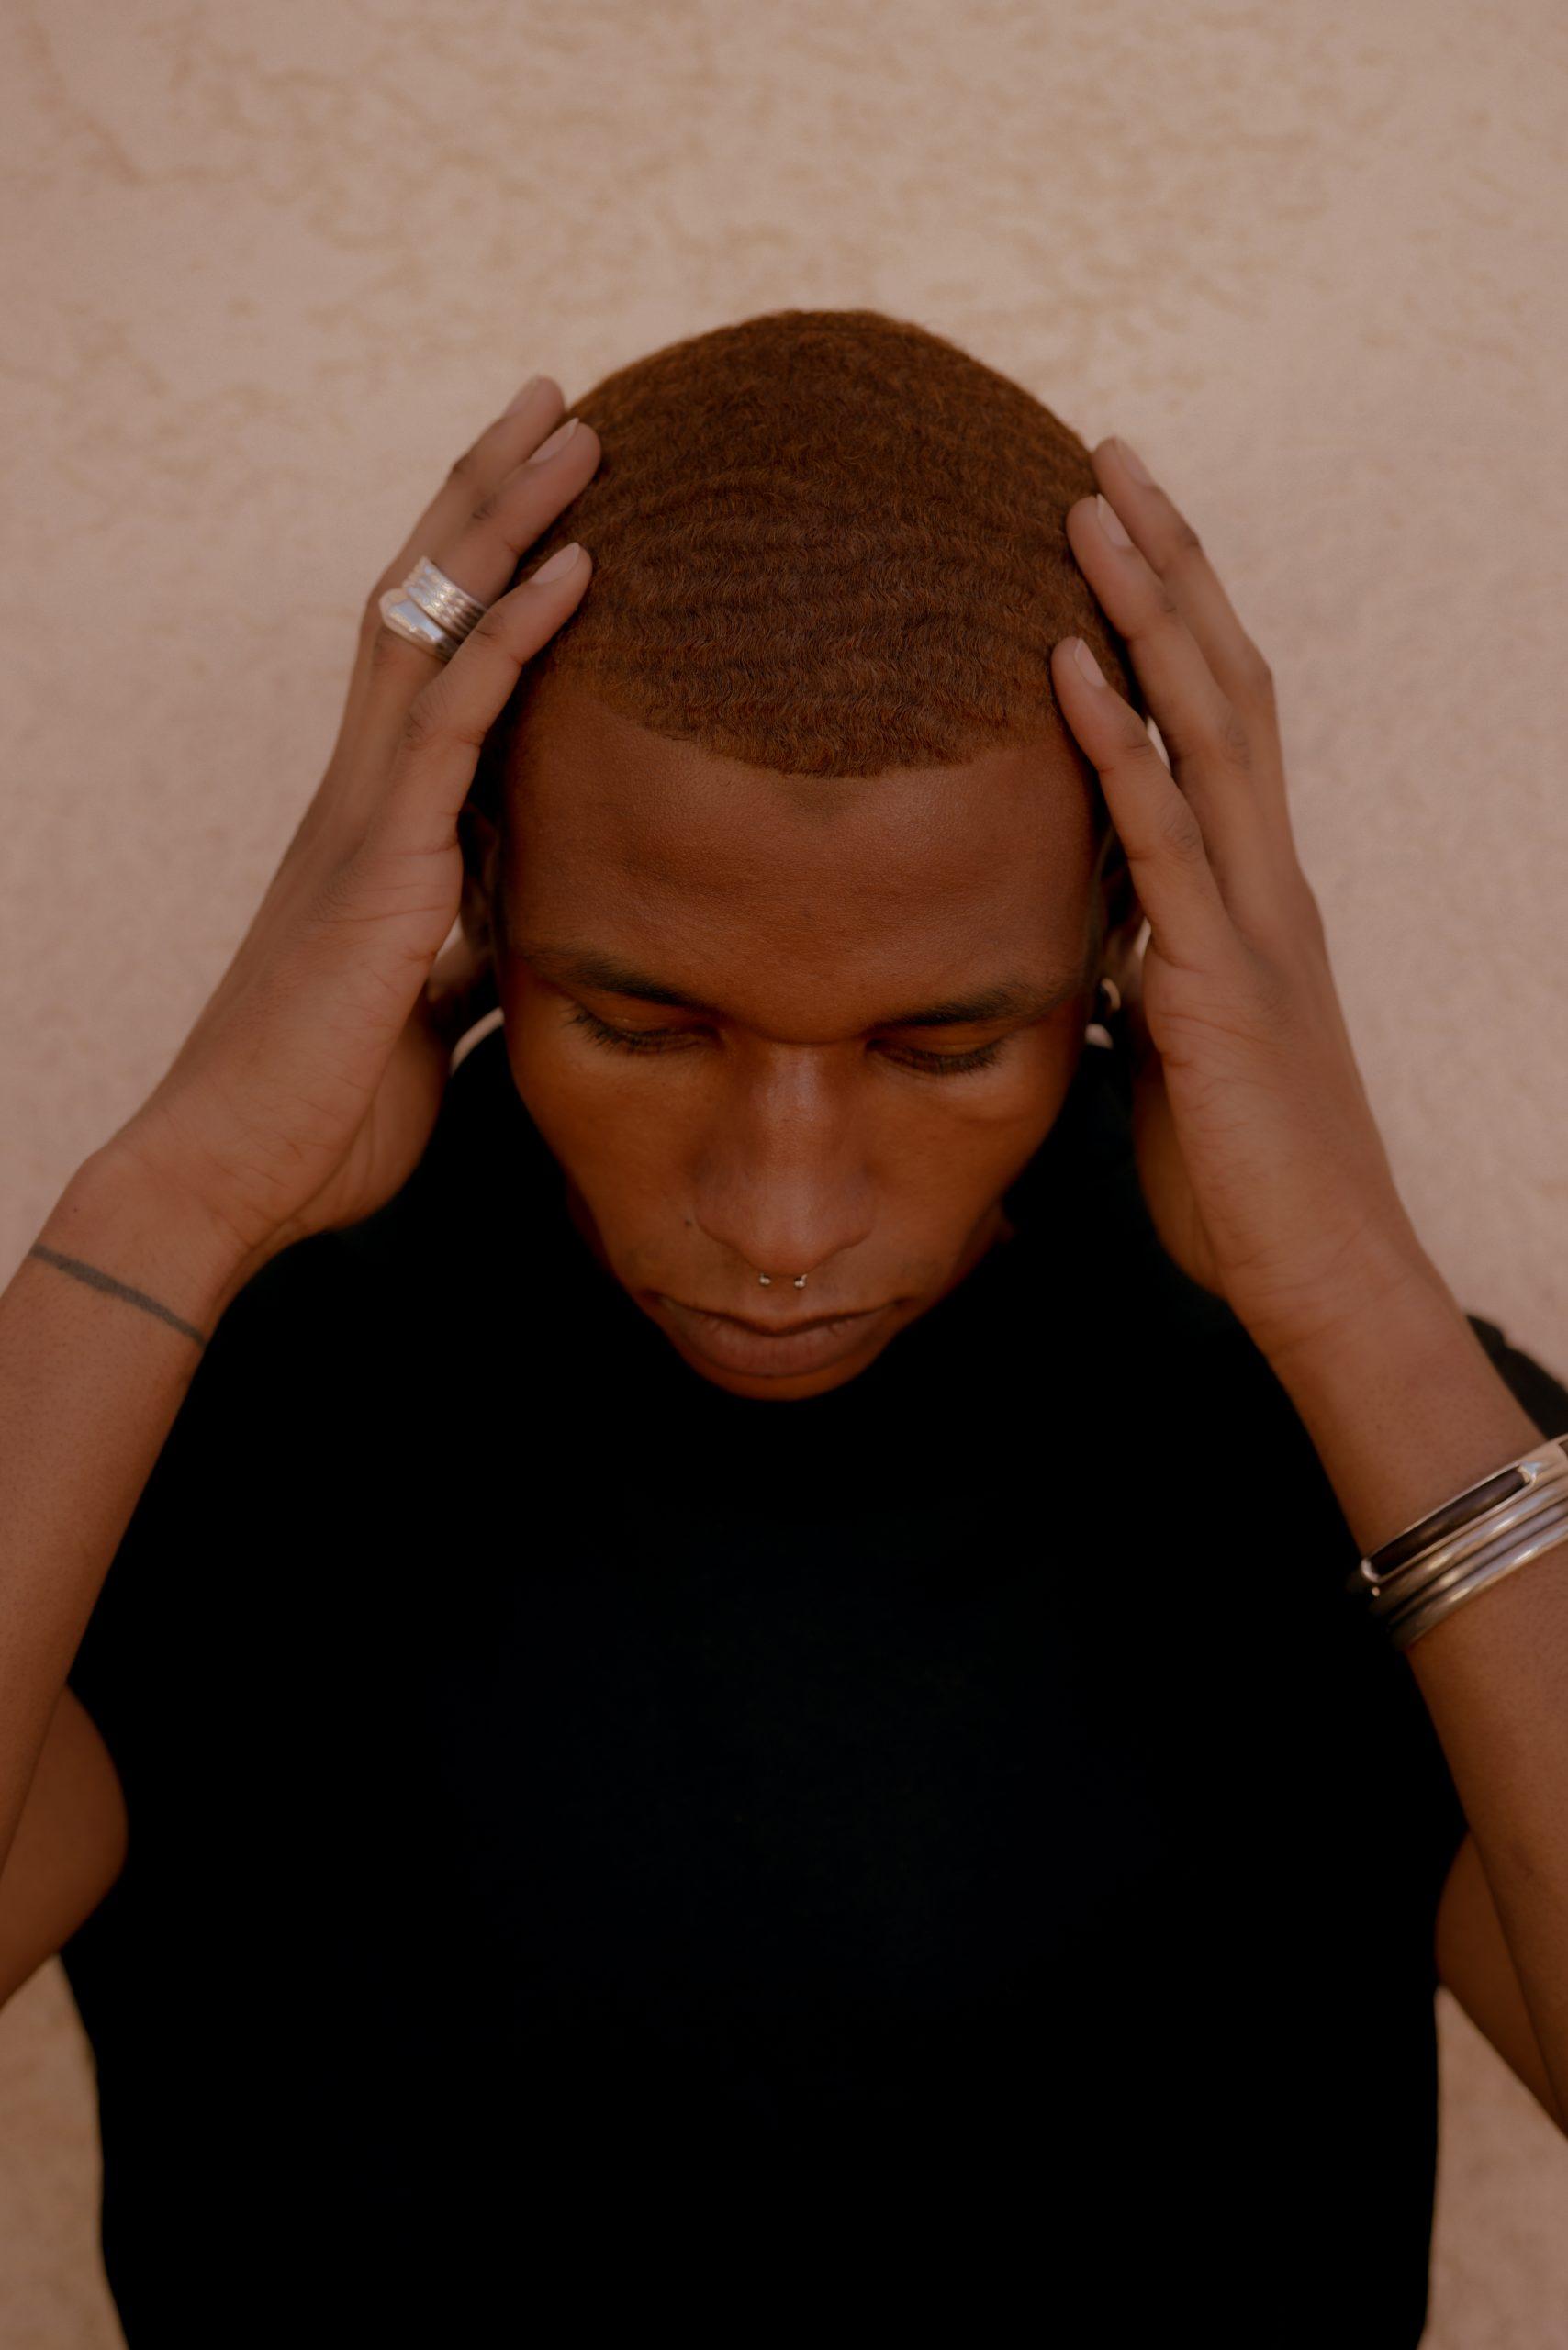 Adidas Commits  million to Pharrell's Black Ambition Program